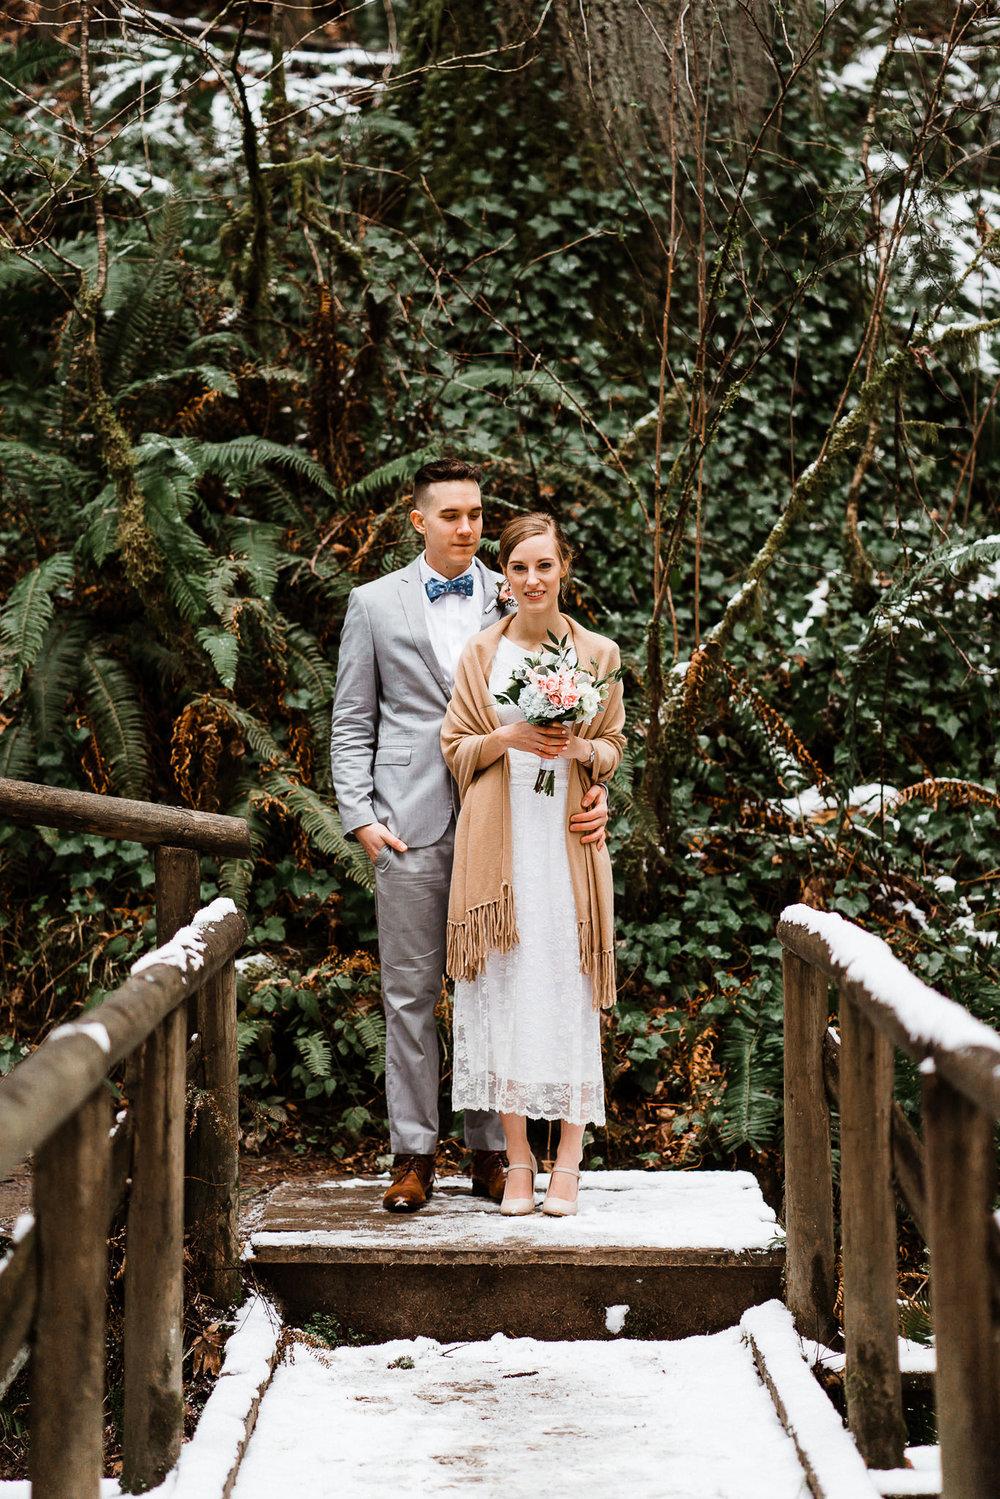 vertical portrait mode wedding photographer